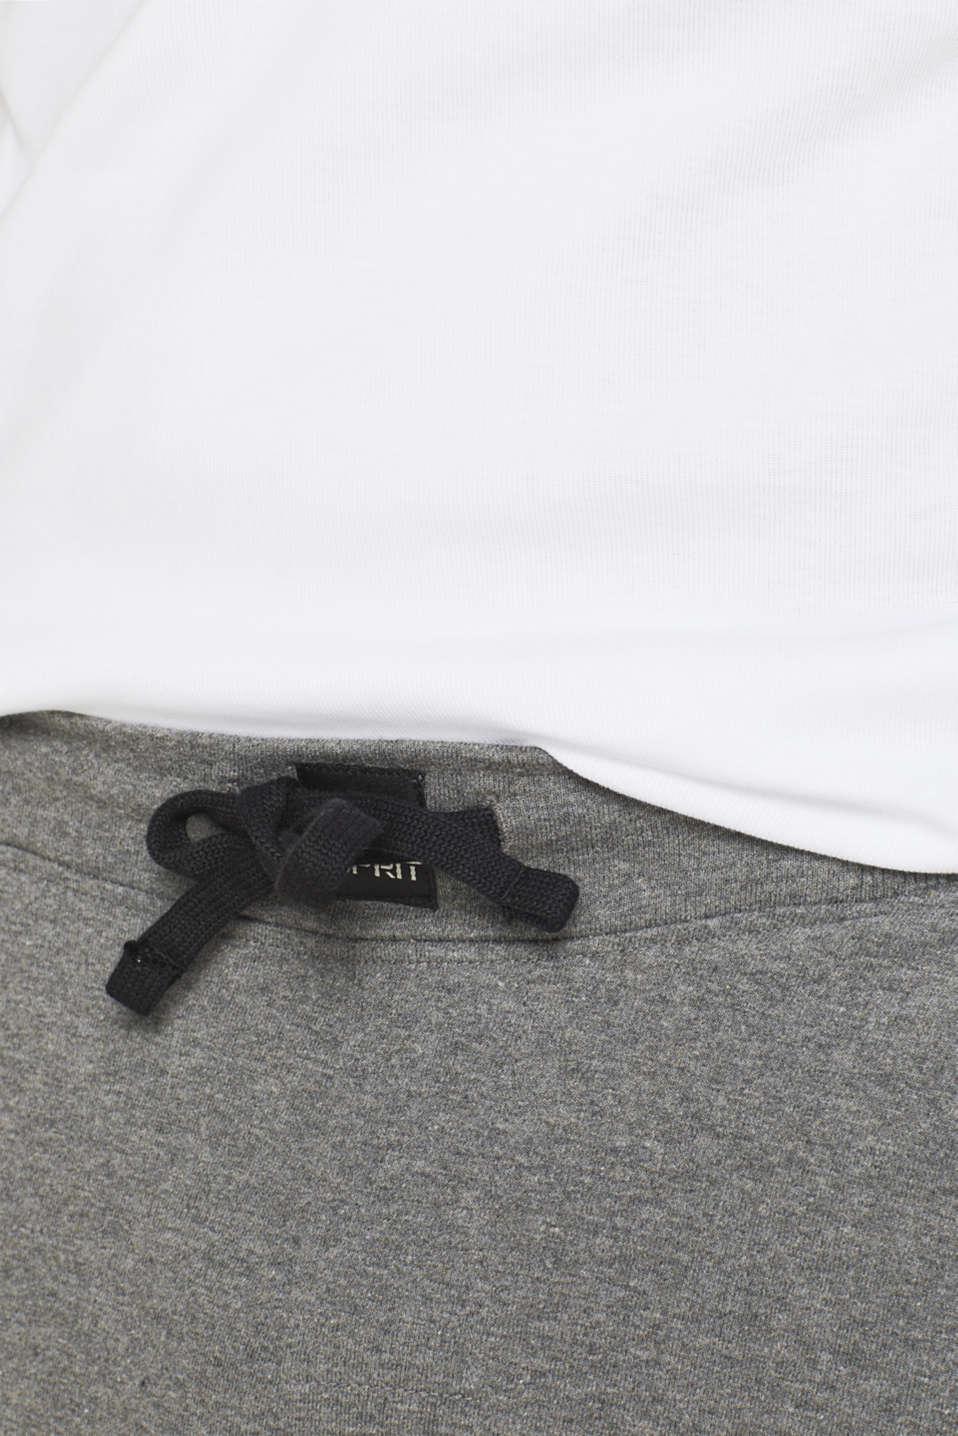 Pyjama trousers made of melange sweatshirt fabric, MEDIUM GREY, detail image number 3